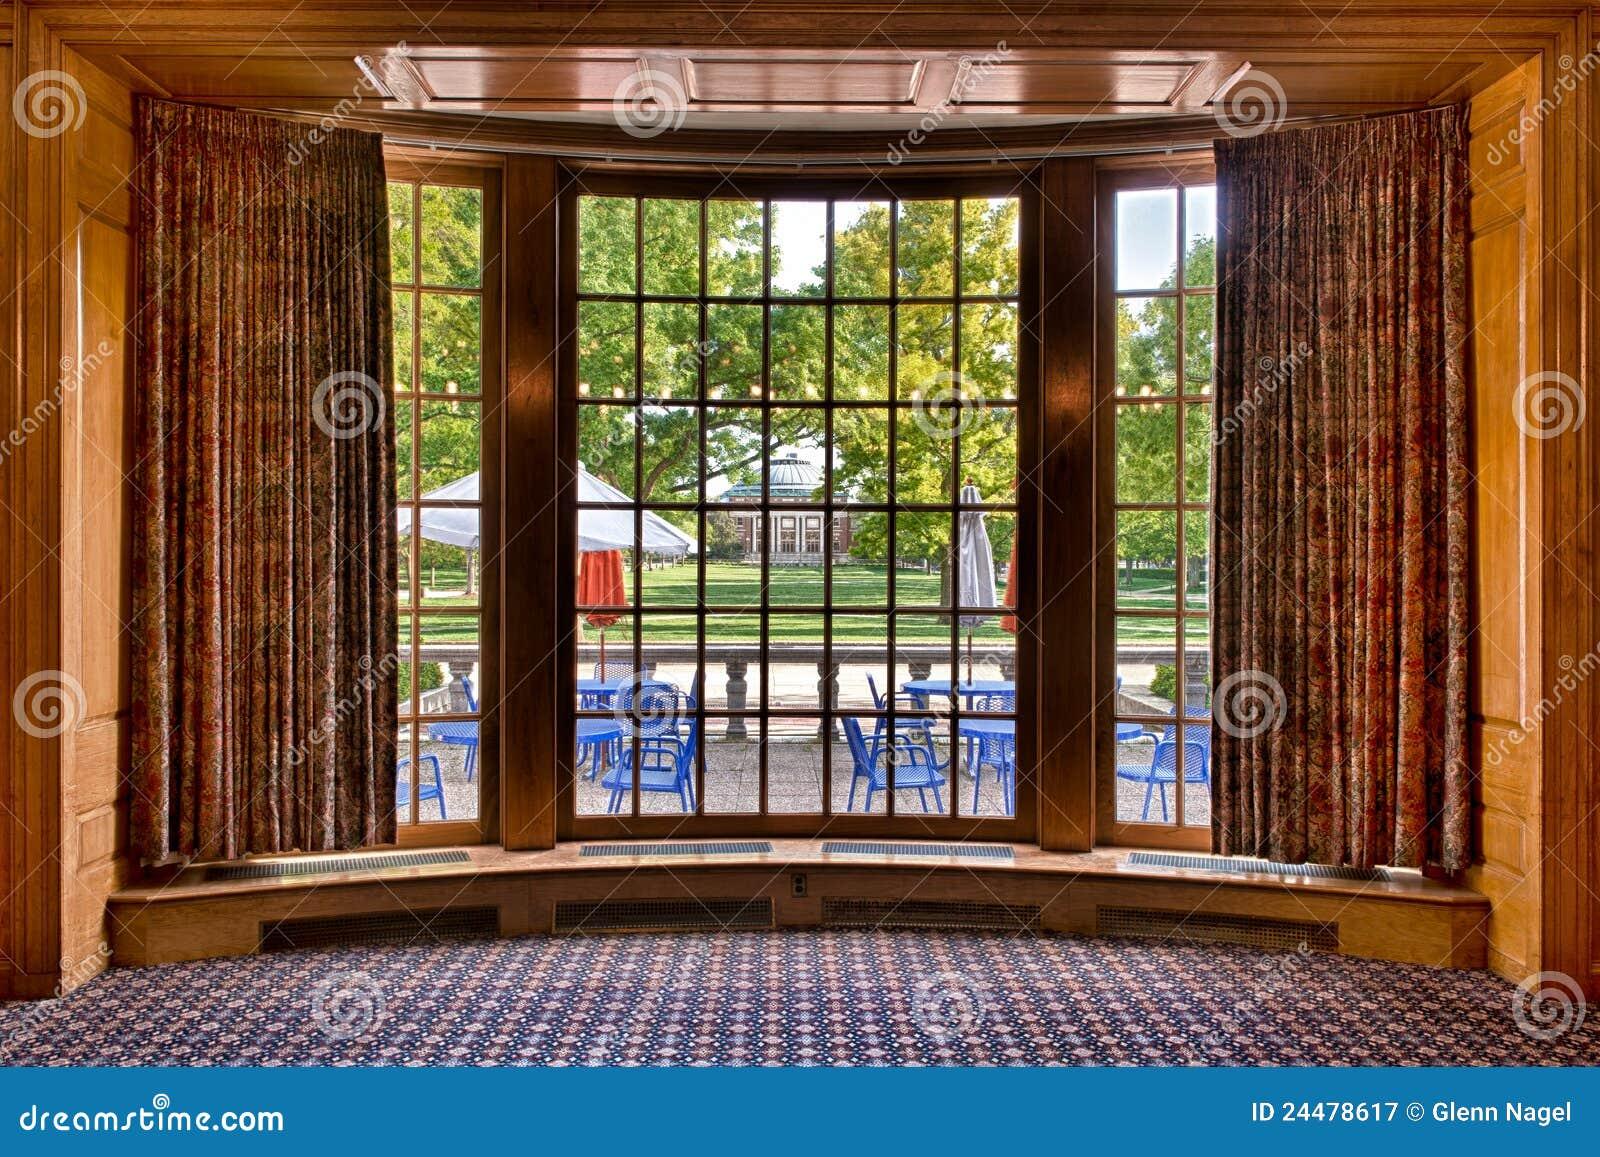 Auditorium From Bay Window Frame Stock Image Image 24478617